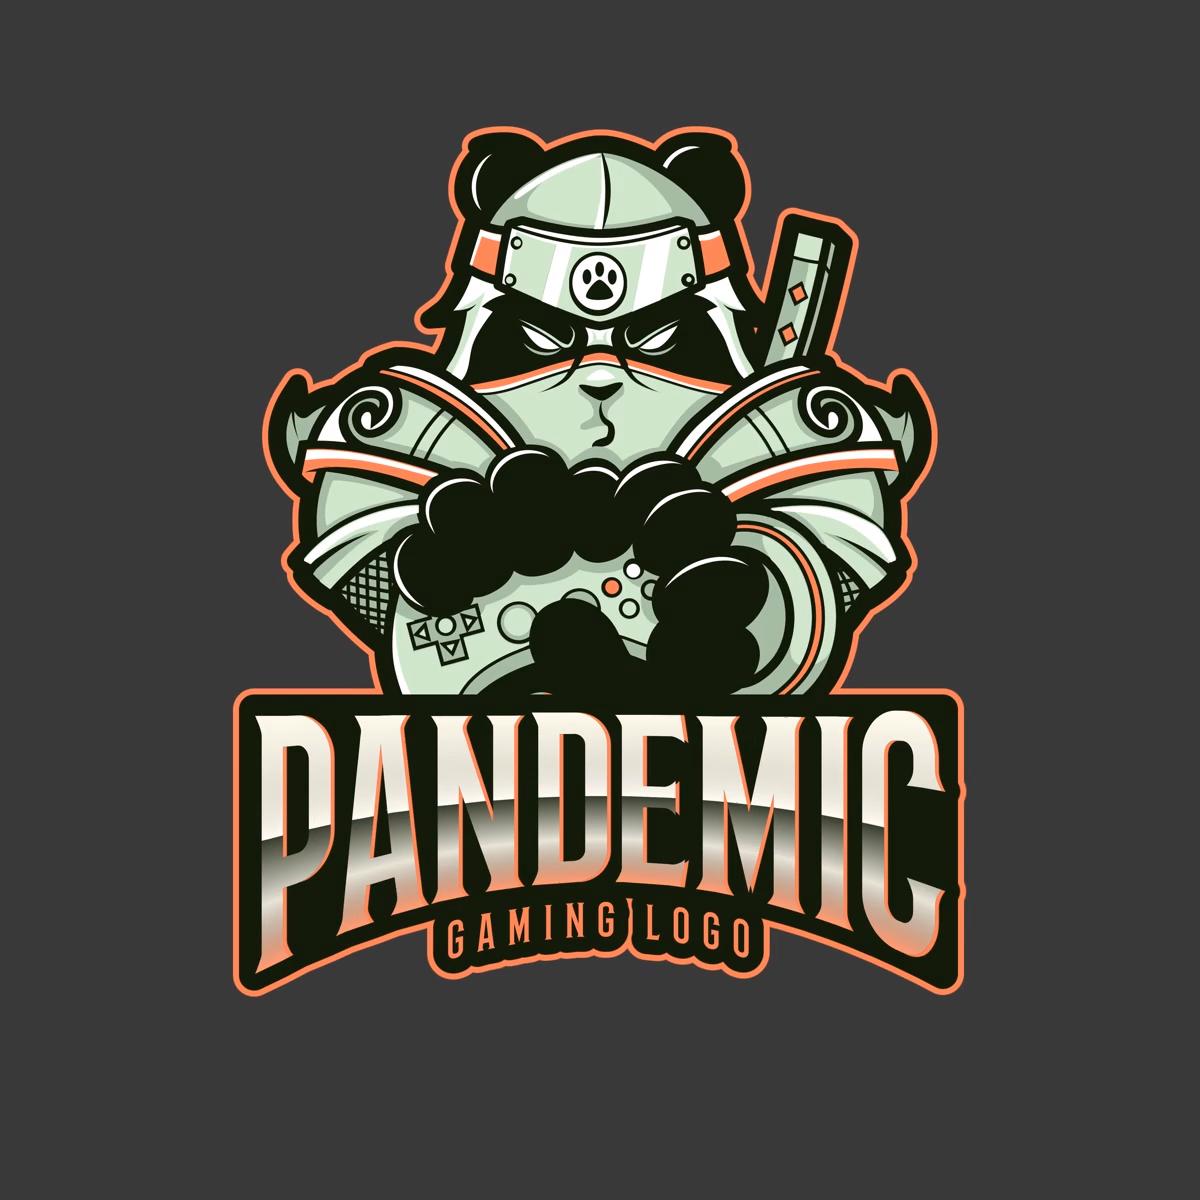 Gaming Logo Maker Featuring a Panda Warrior